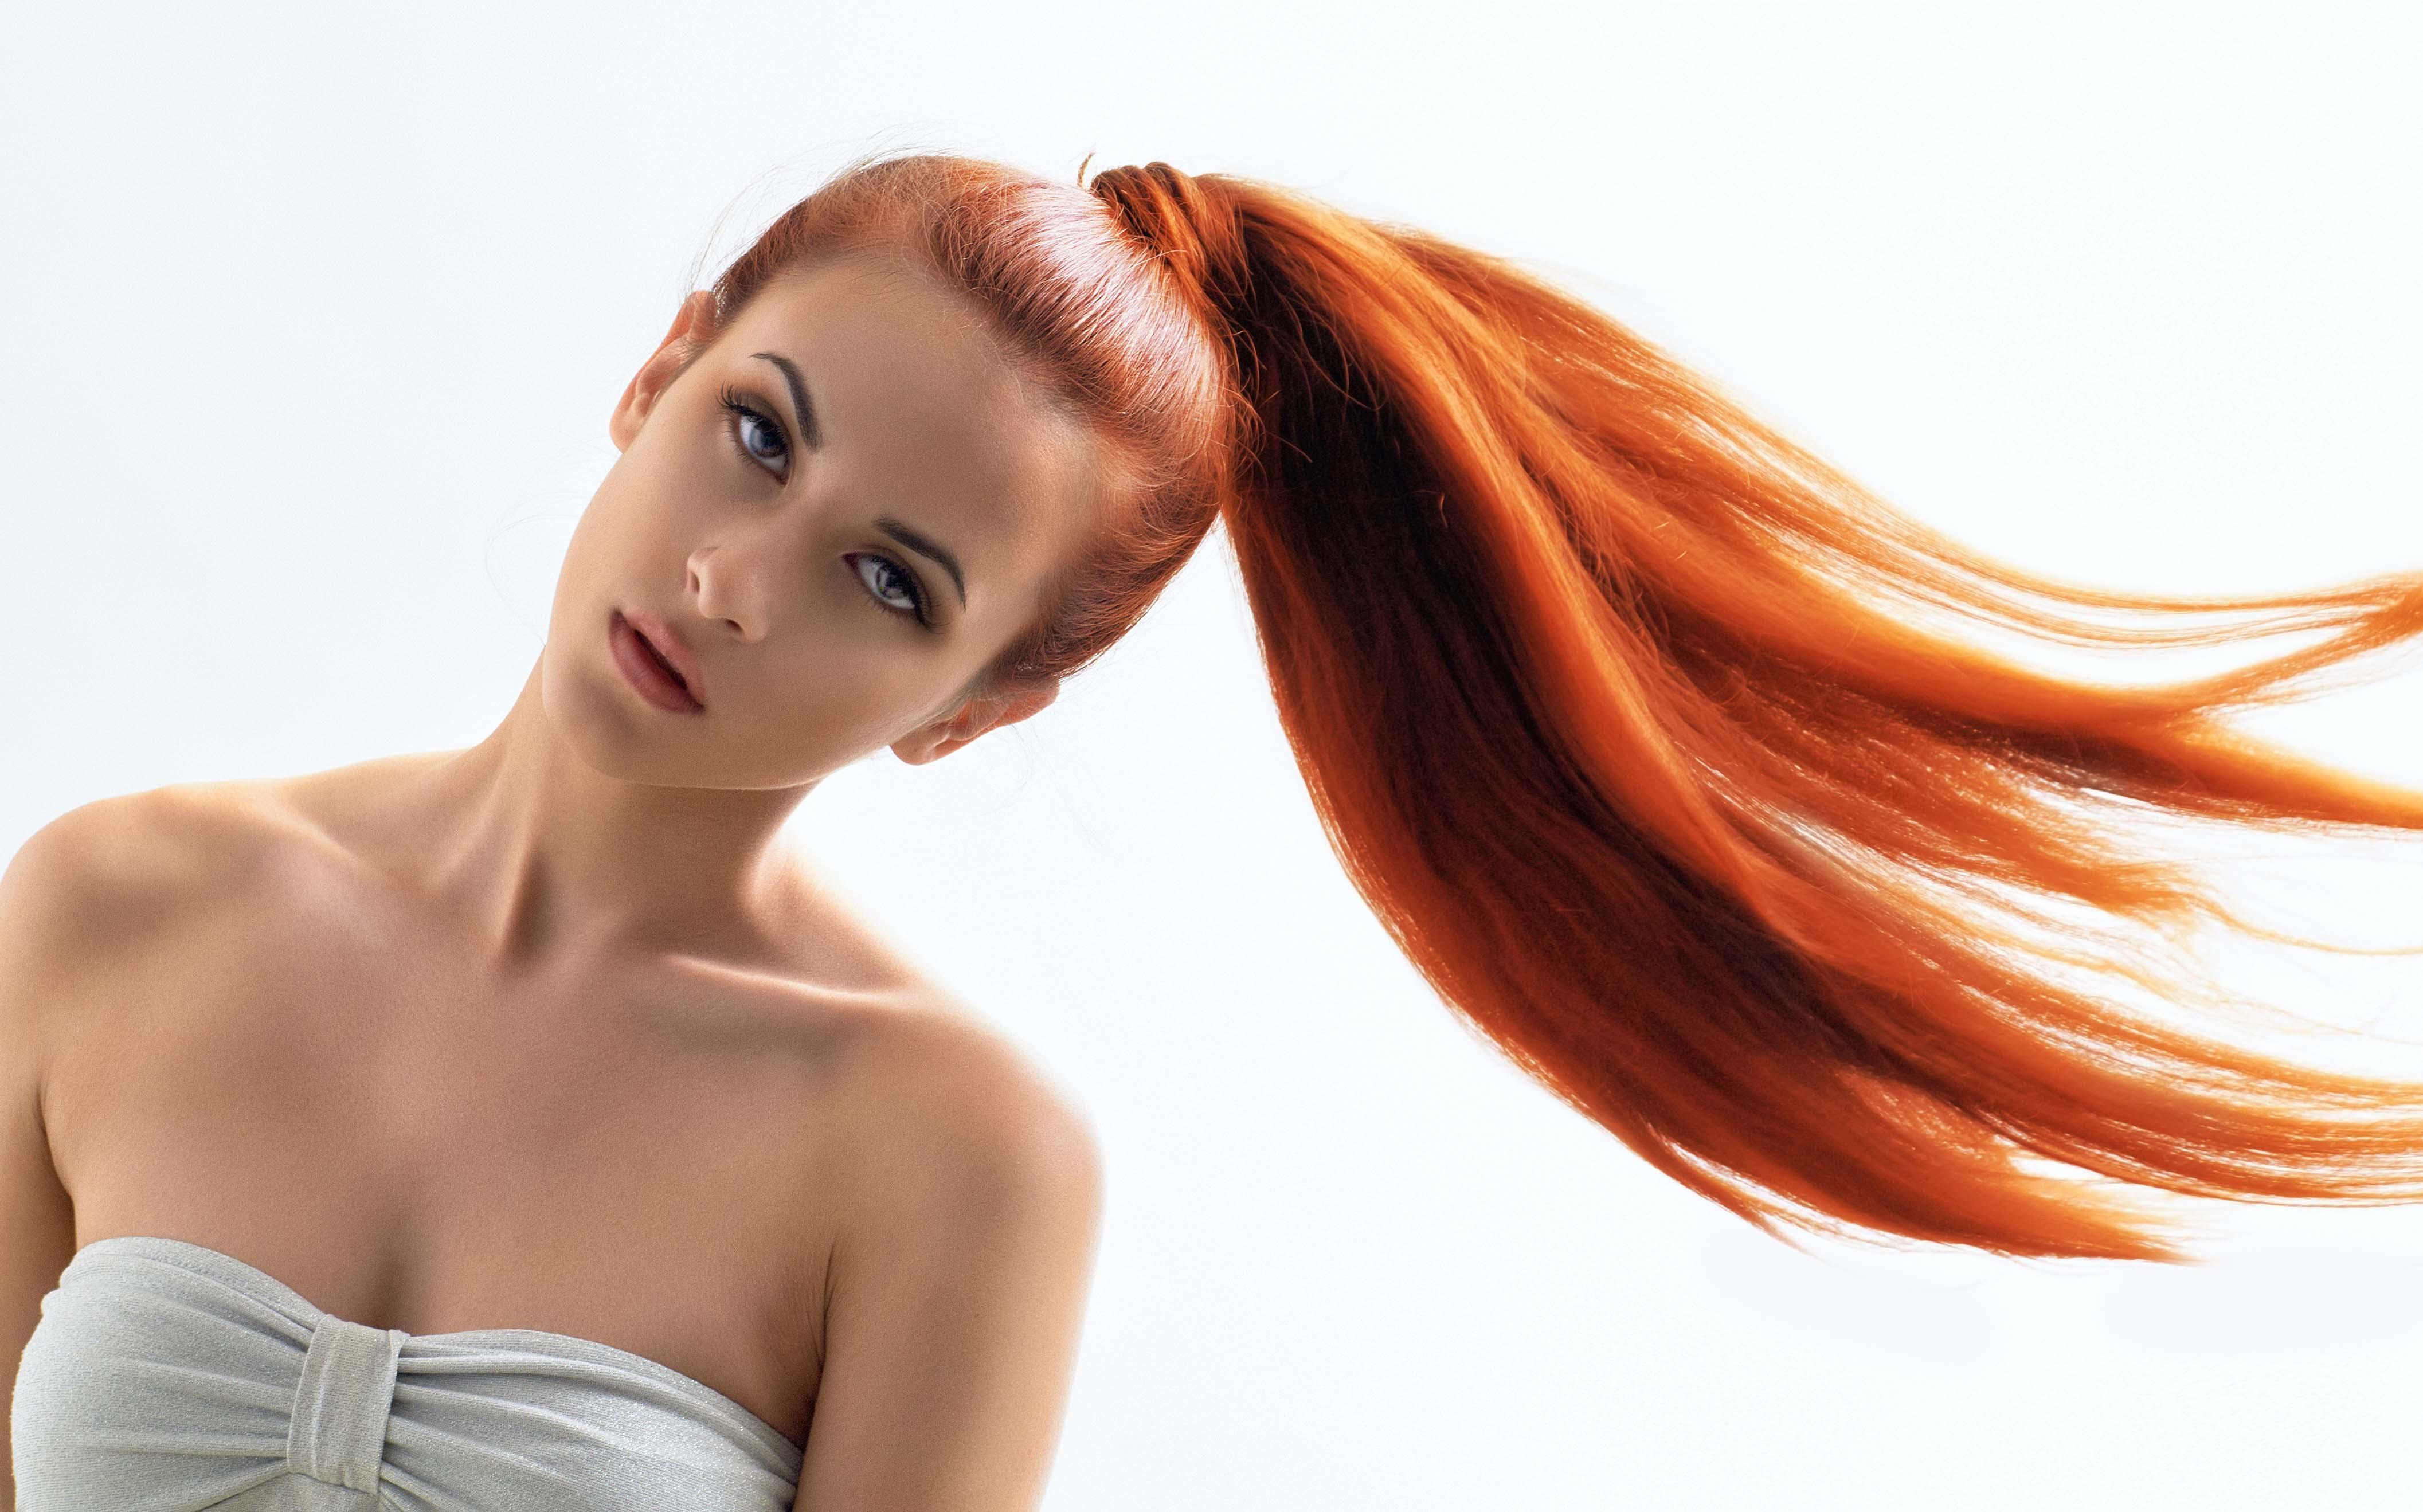 ponytail-primavera-zephir-parrucchieri-ascona-muralto.jpg